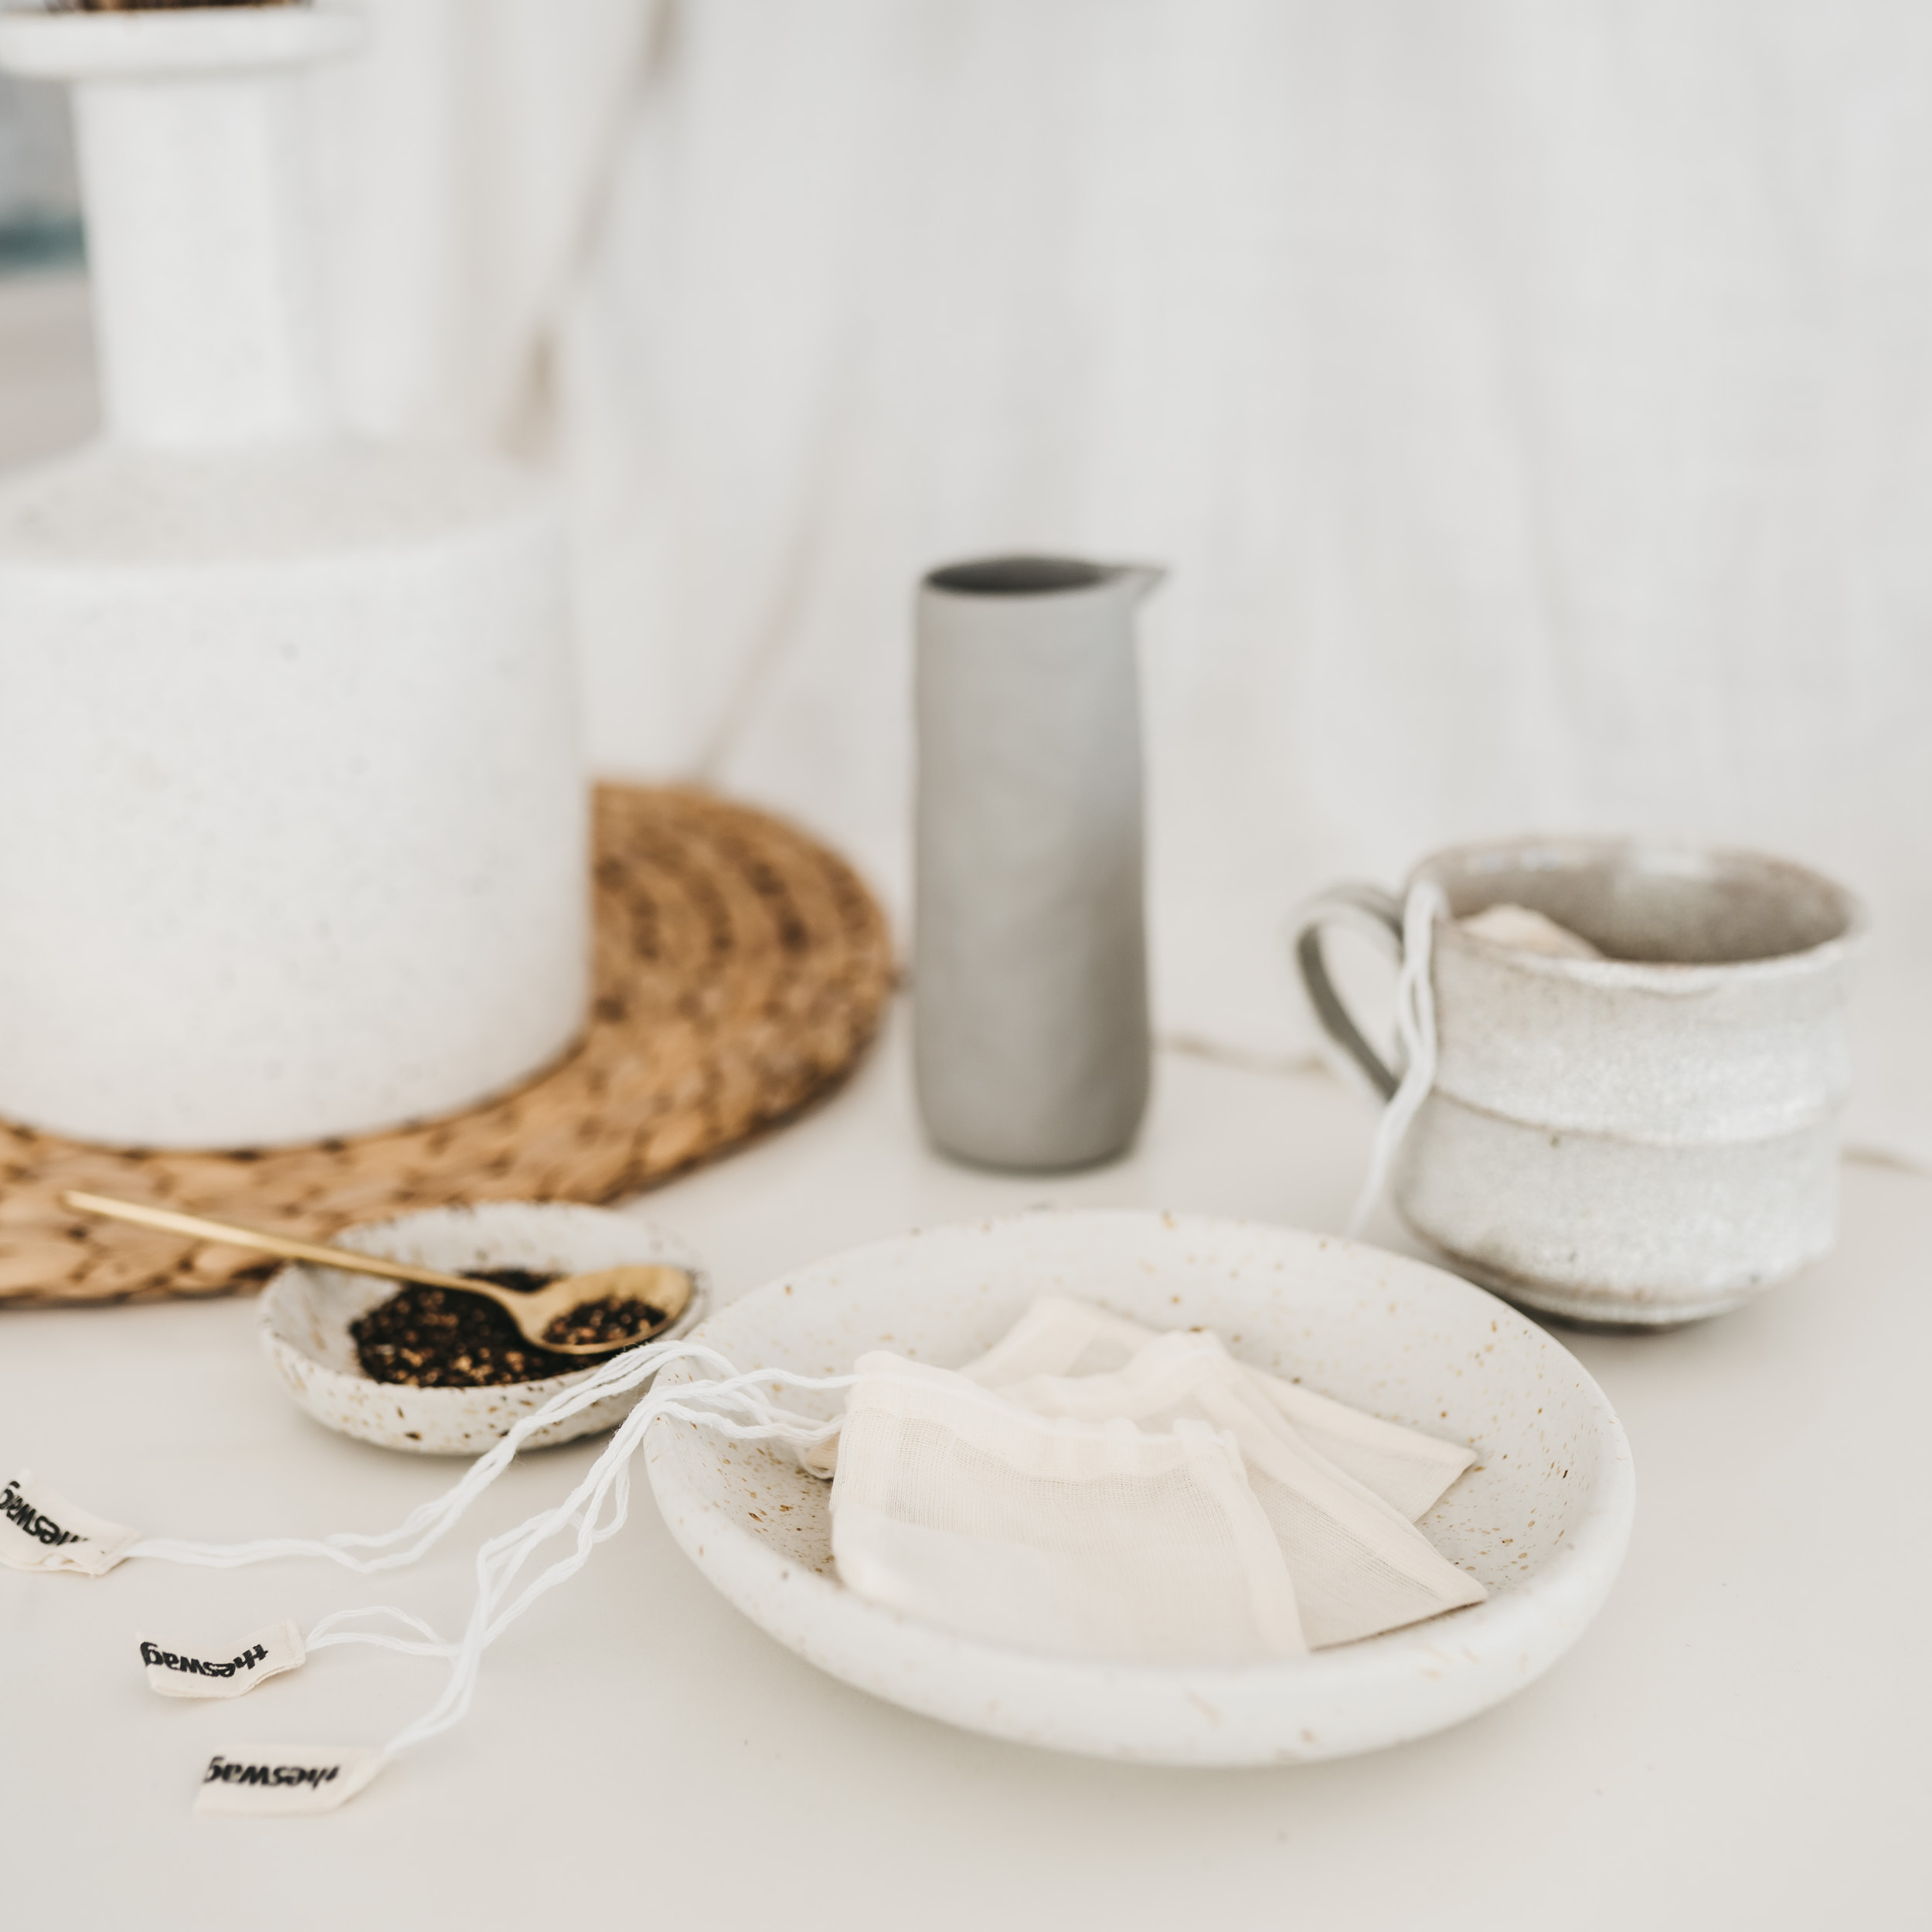 keira-mason-the-swag-tea-bags-set.jpg